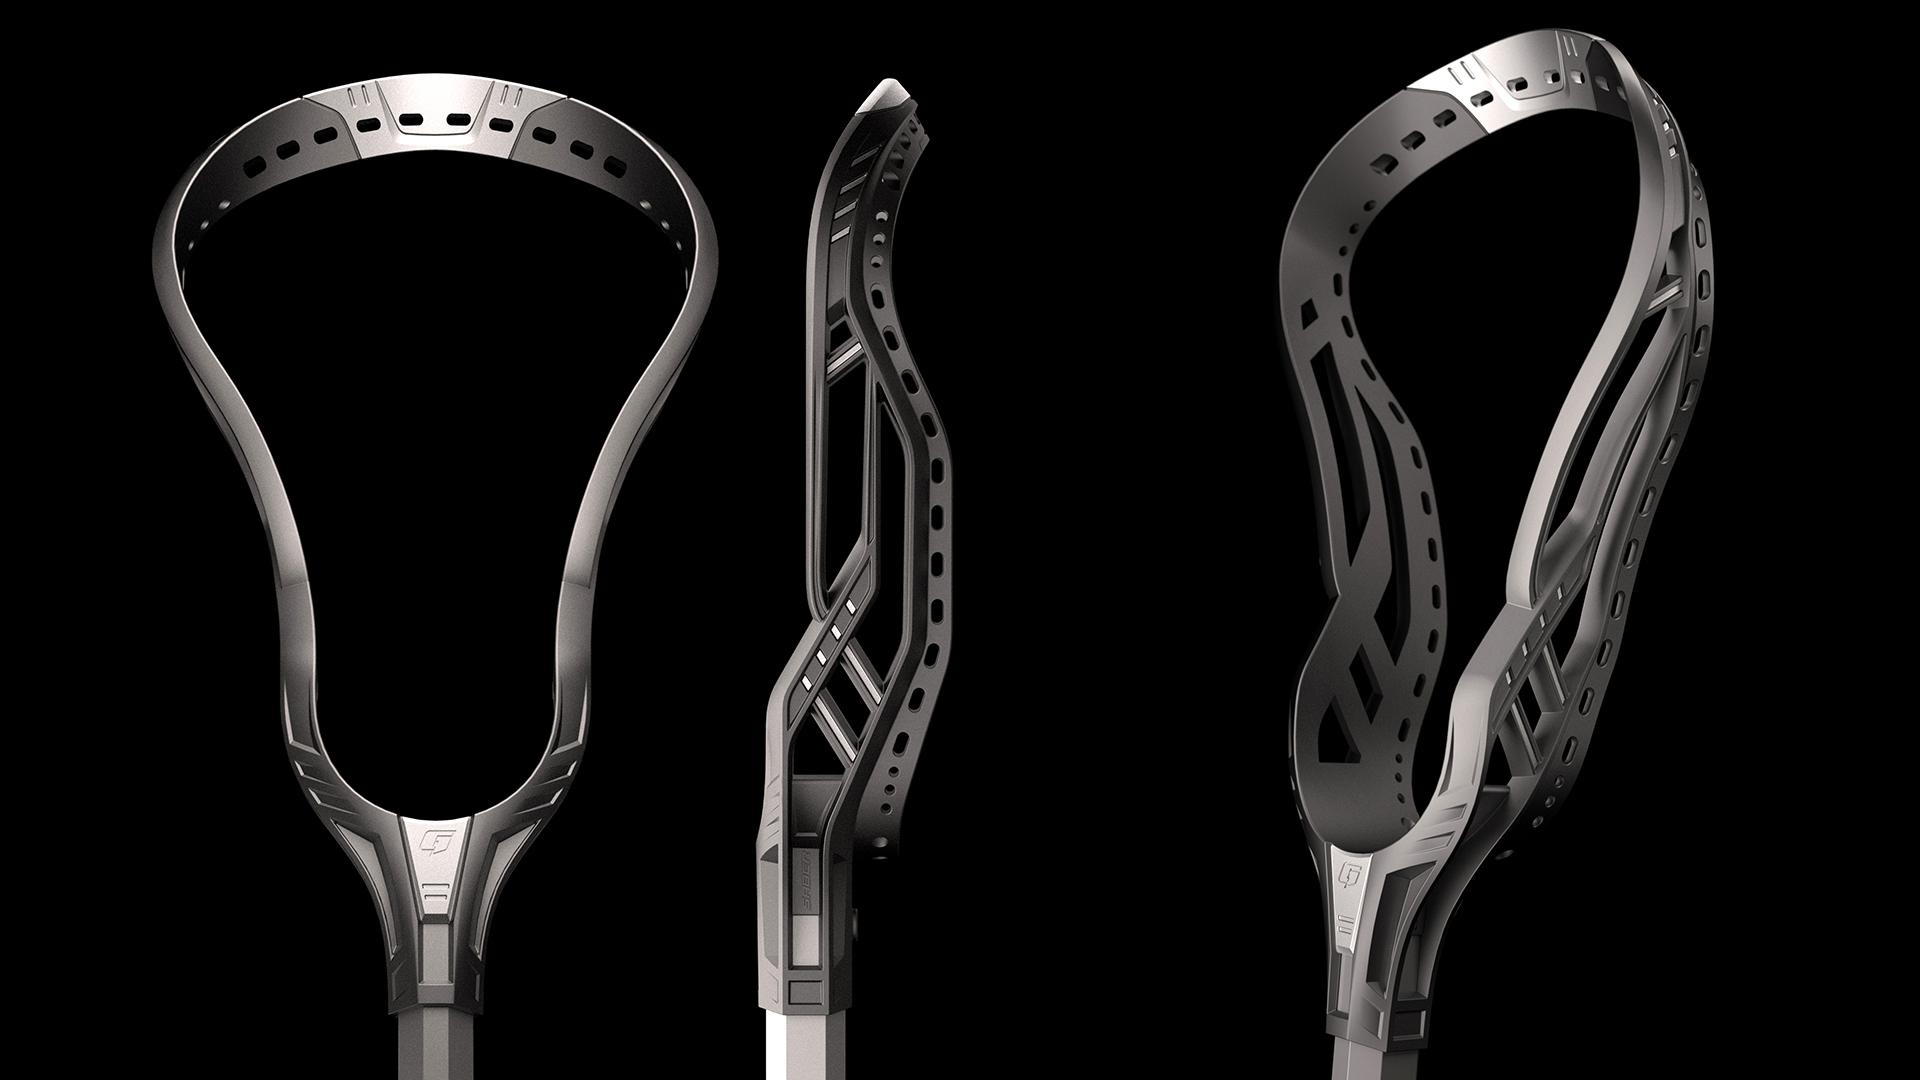 priority_designs_lacrosse_design_and_engineering_004